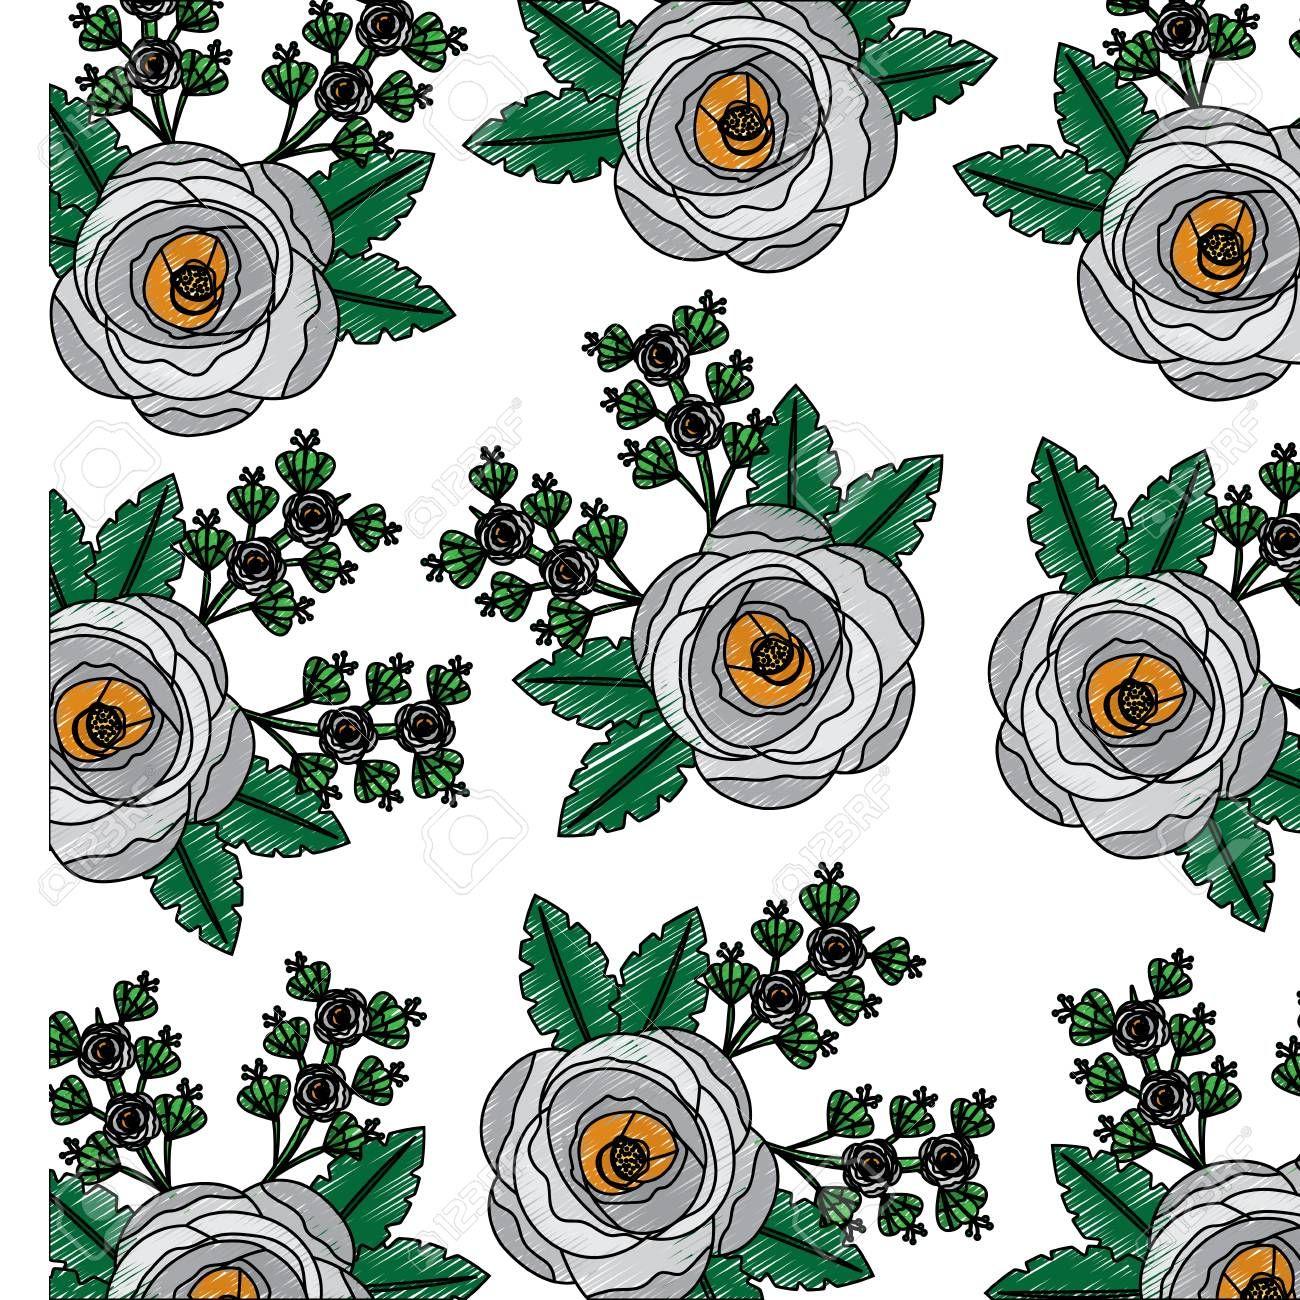 poppy flowers bud botanical decoration pattern vector illustration Illustration , #Sponsored, #bud, #botanical, #poppy, #flowers, #decoration